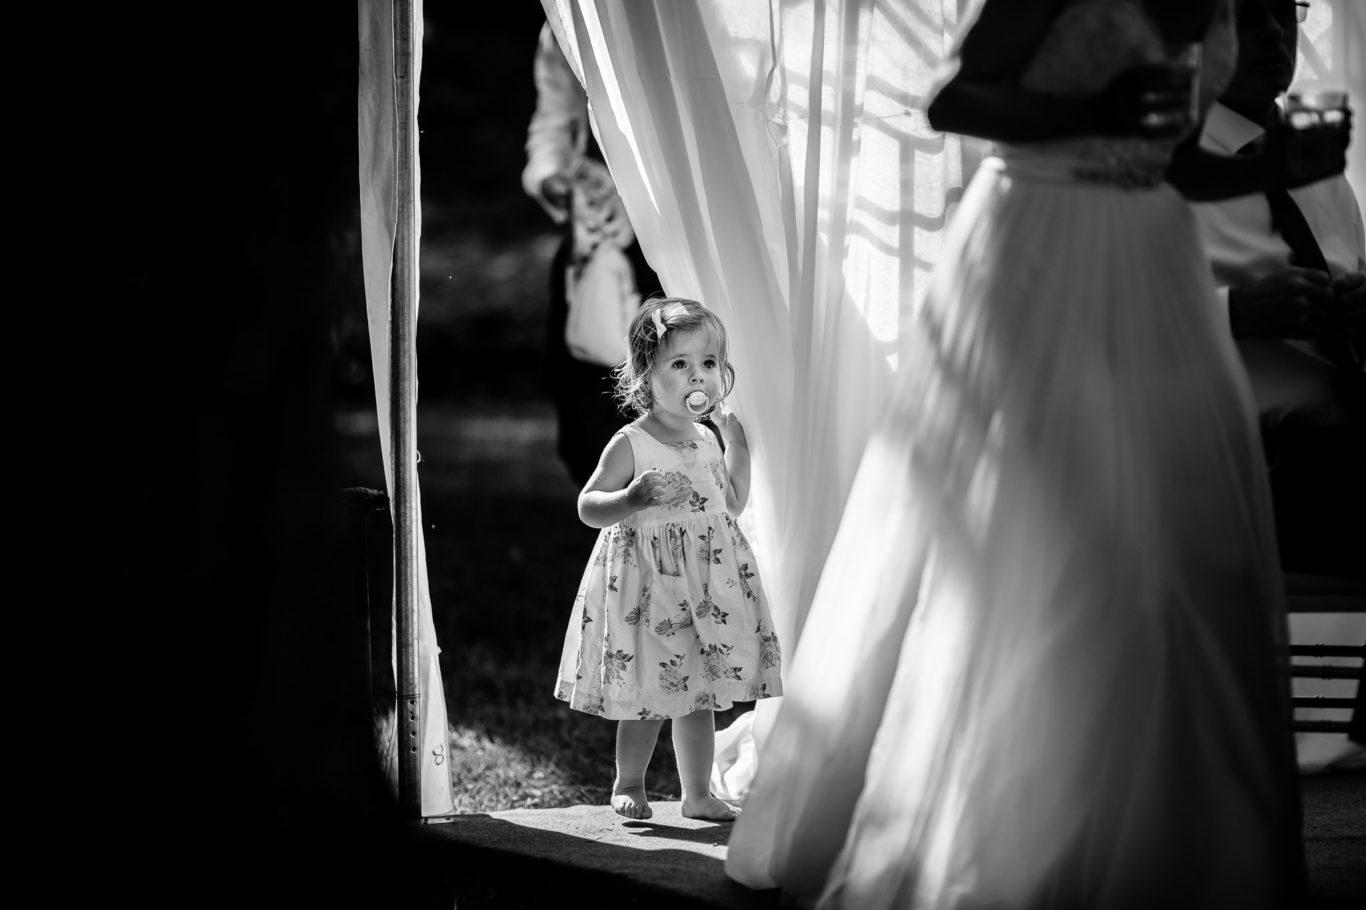 0468-fotografie-nunta-conacul-apafi-ana-simion-fotograf-ciprian-dumitrescu-cd2_0701